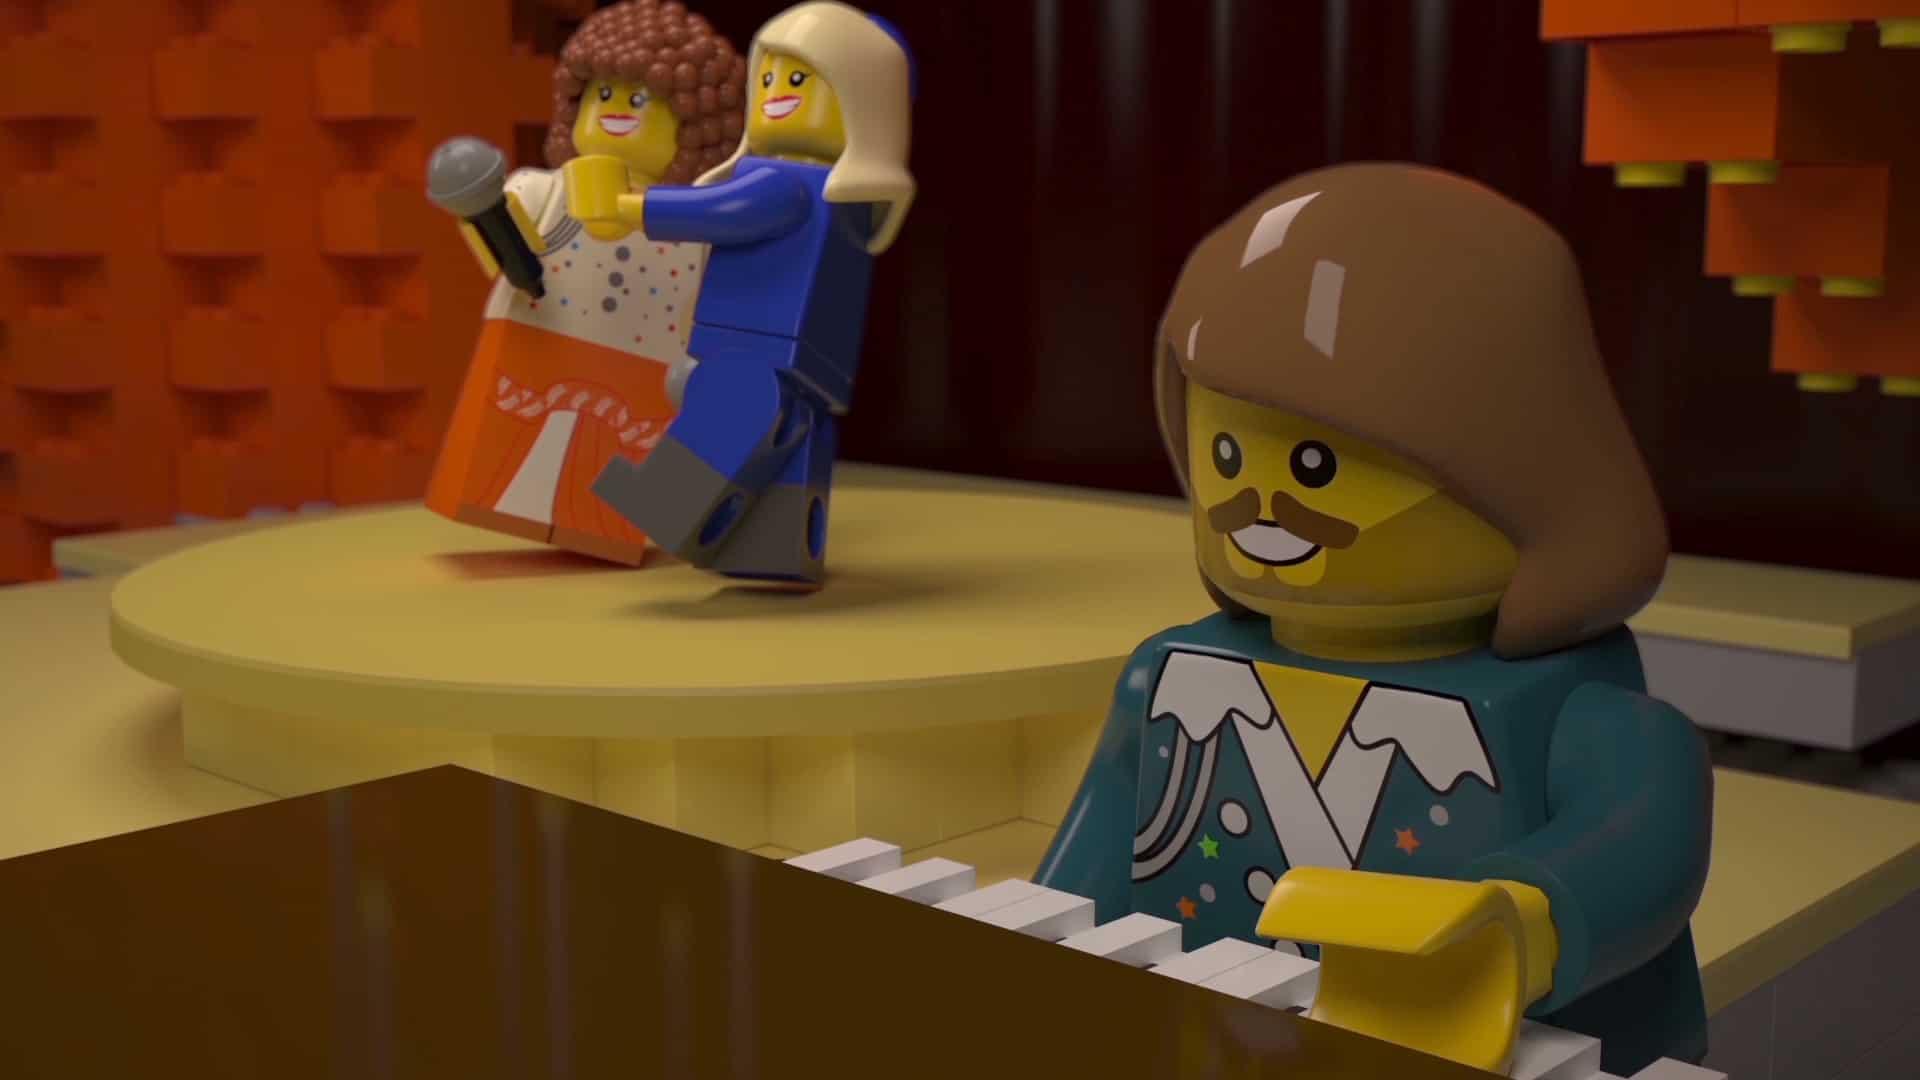 LEGO Happy Birthday Eurovision